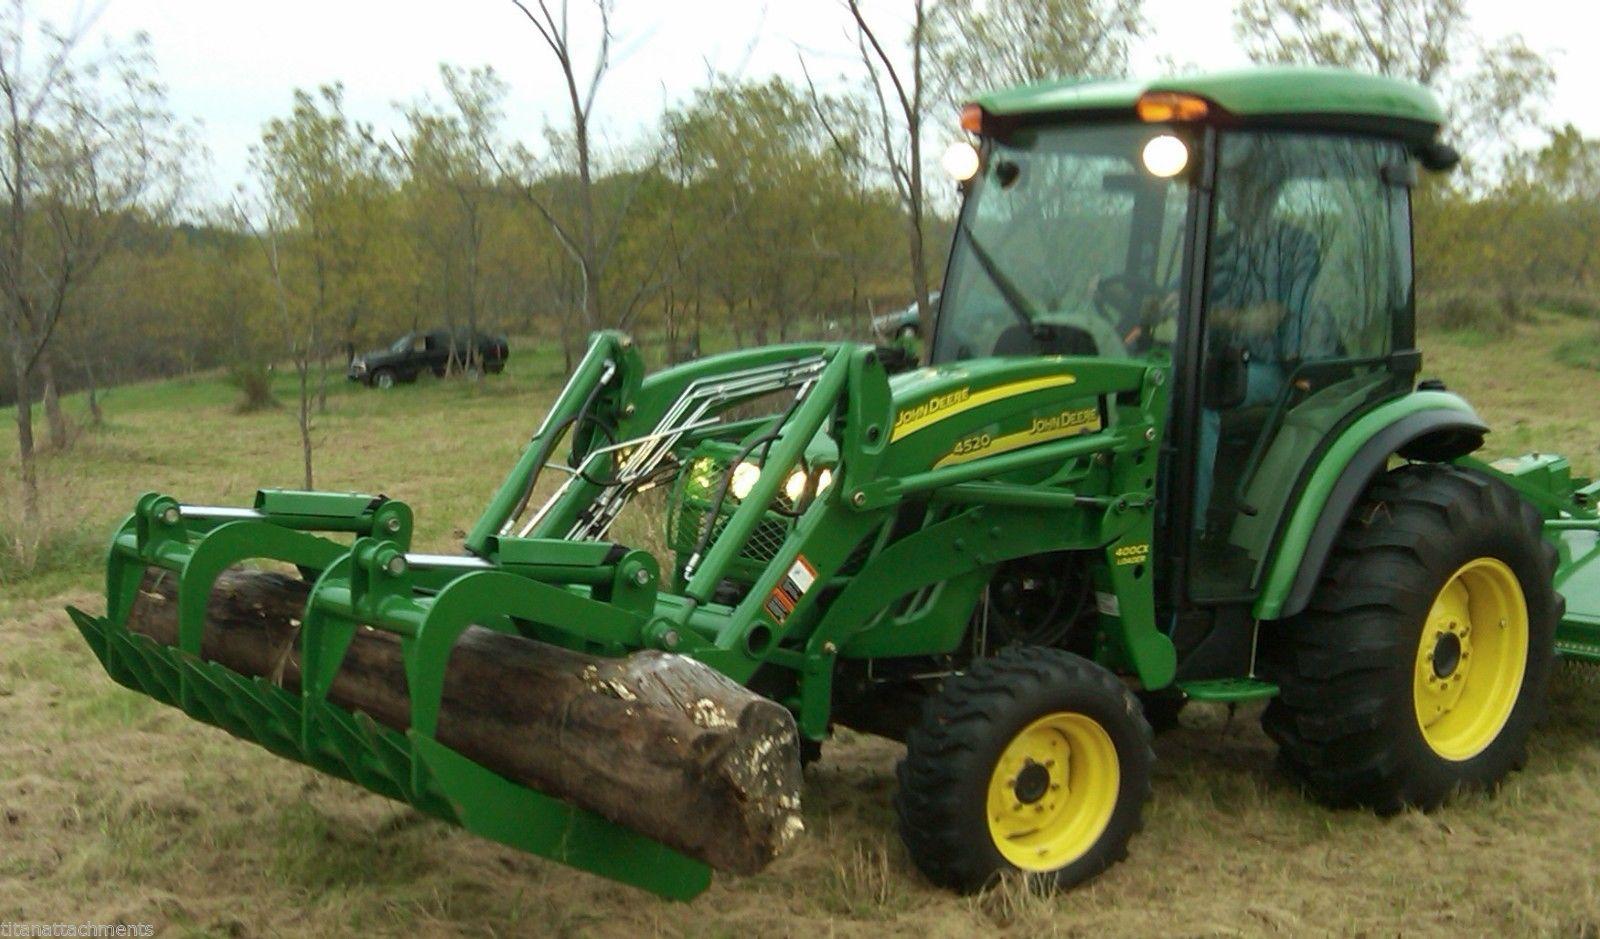 72 Root Grapple Bucket Attachment for John Deere 200 300 ...